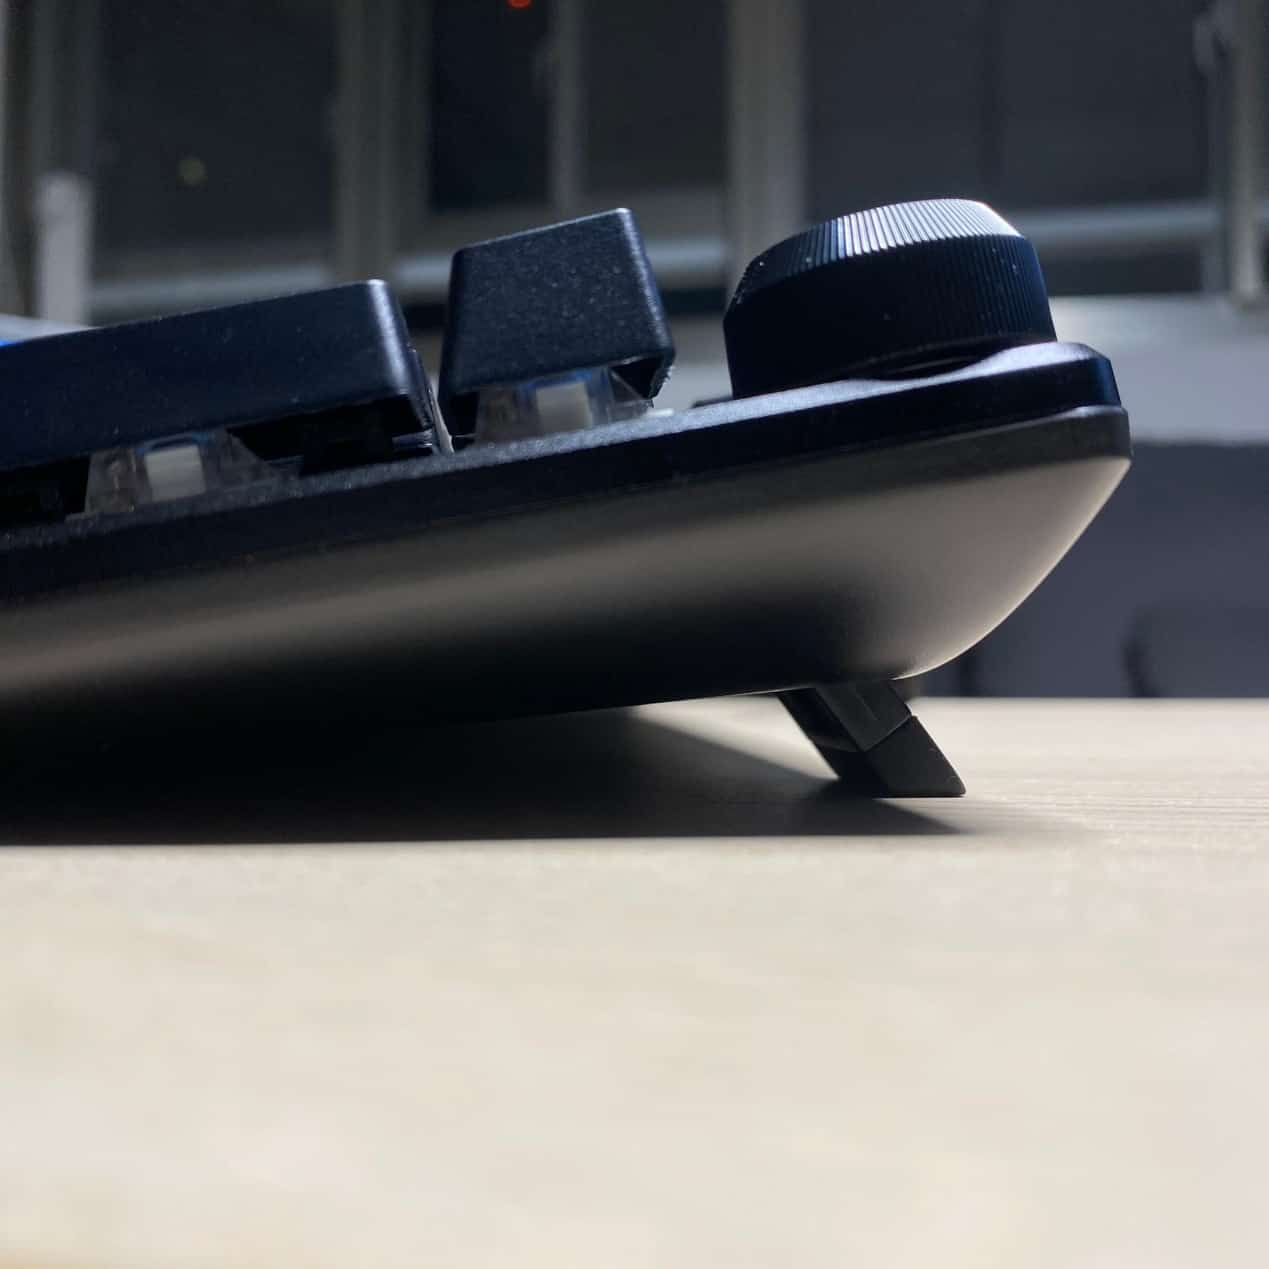 FXR-HKM-61旋音戰狐機械電競鍵盤-可調角度斜角